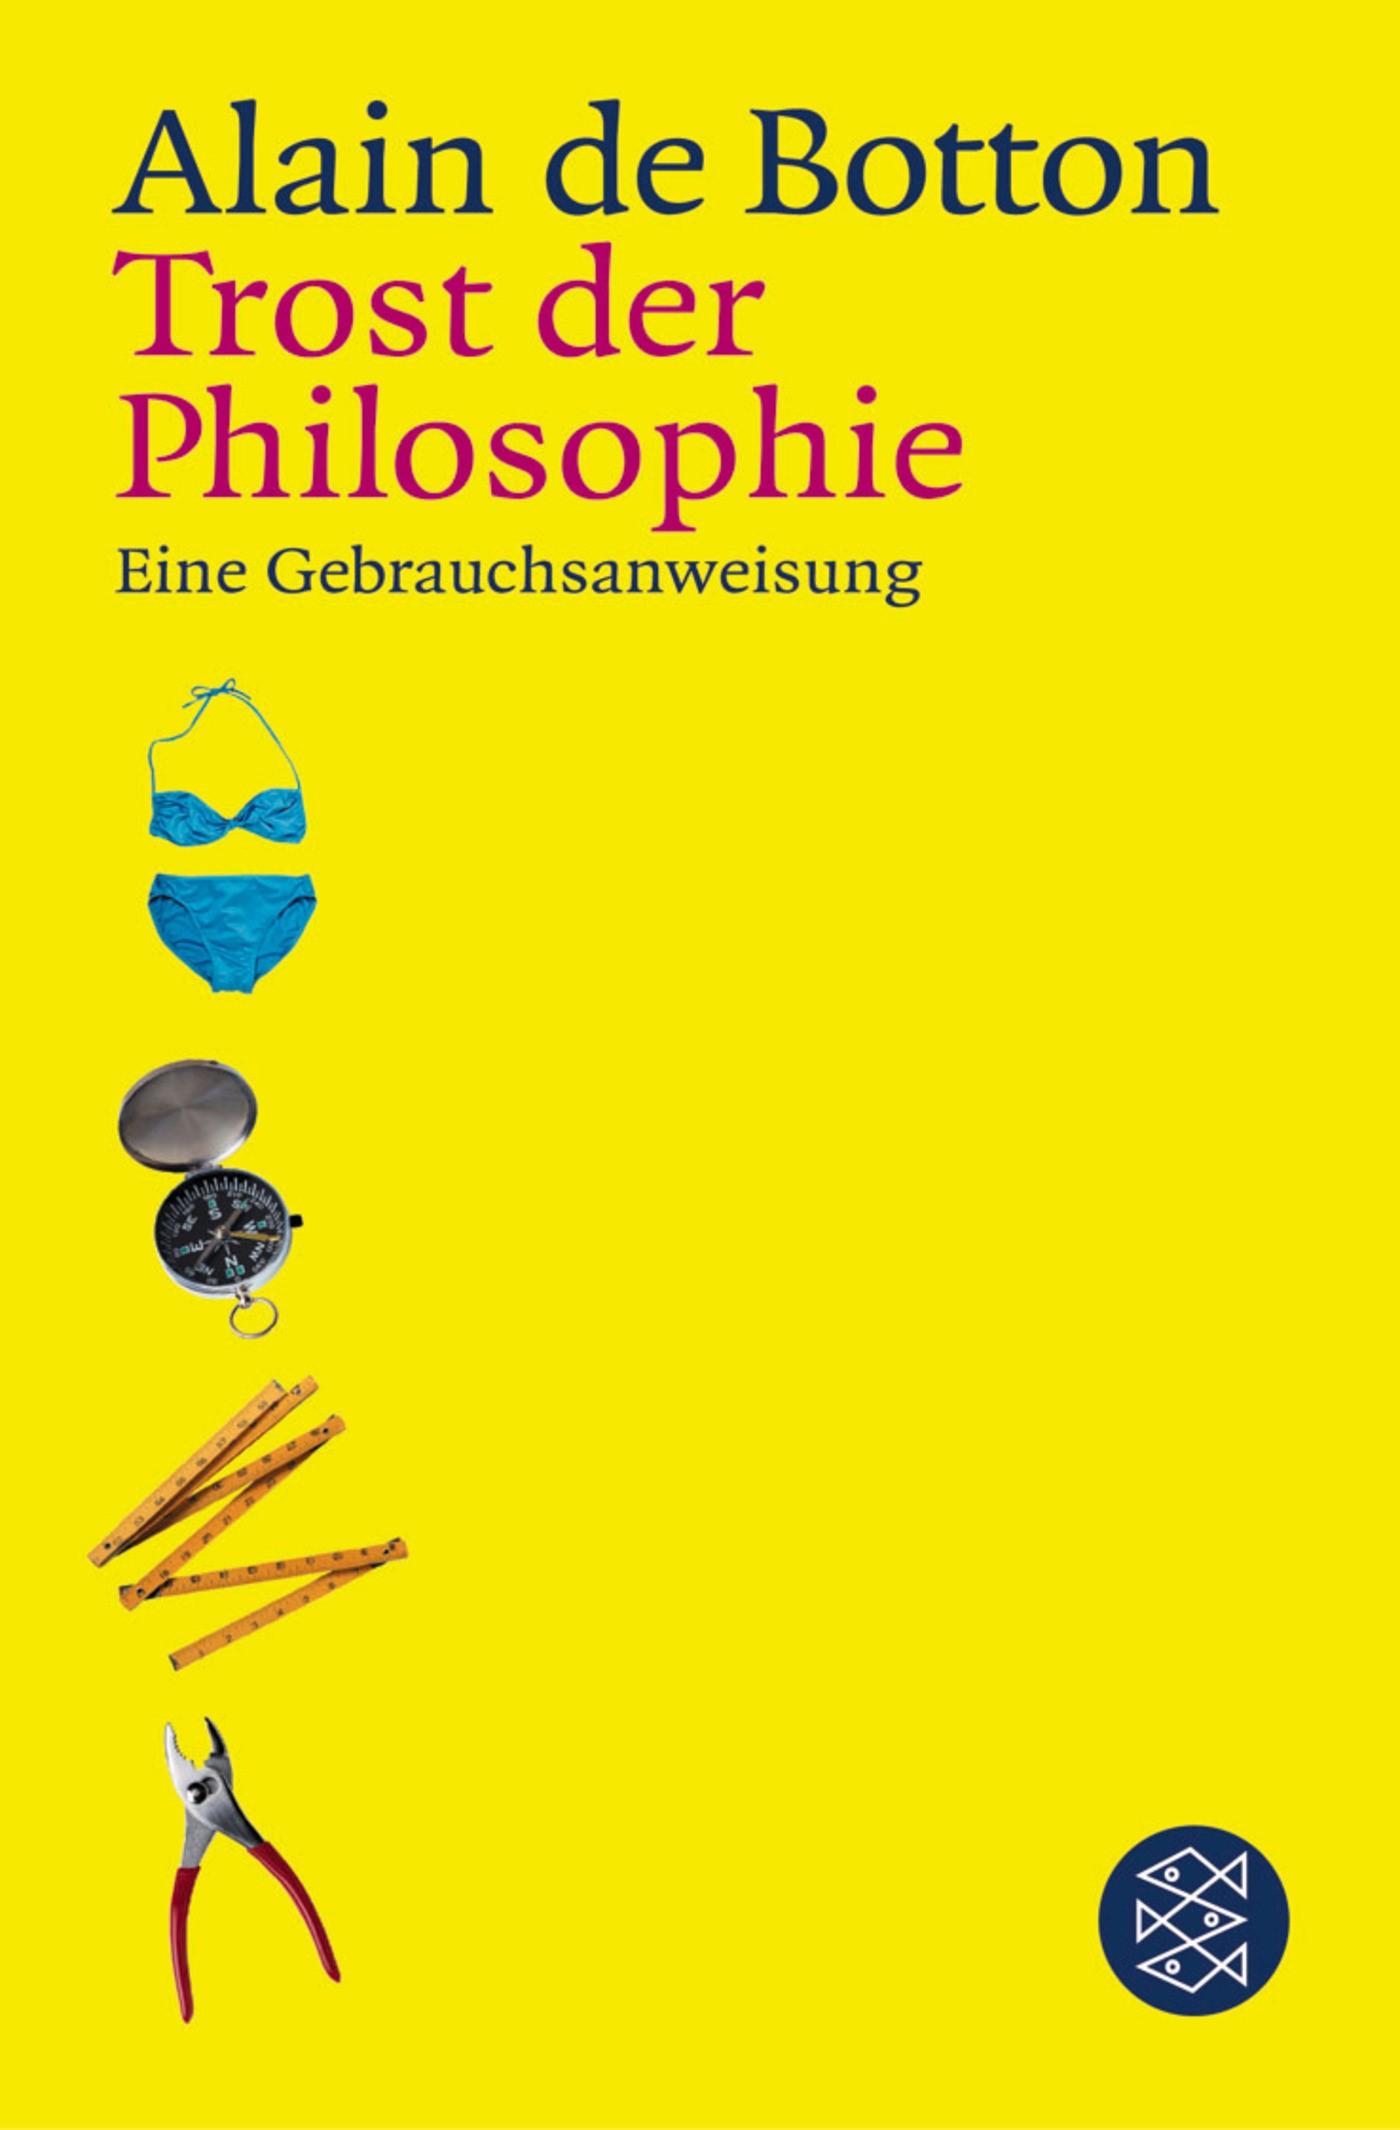 Trost der Philosophie | Botton, 2002 | Buch (Cover)